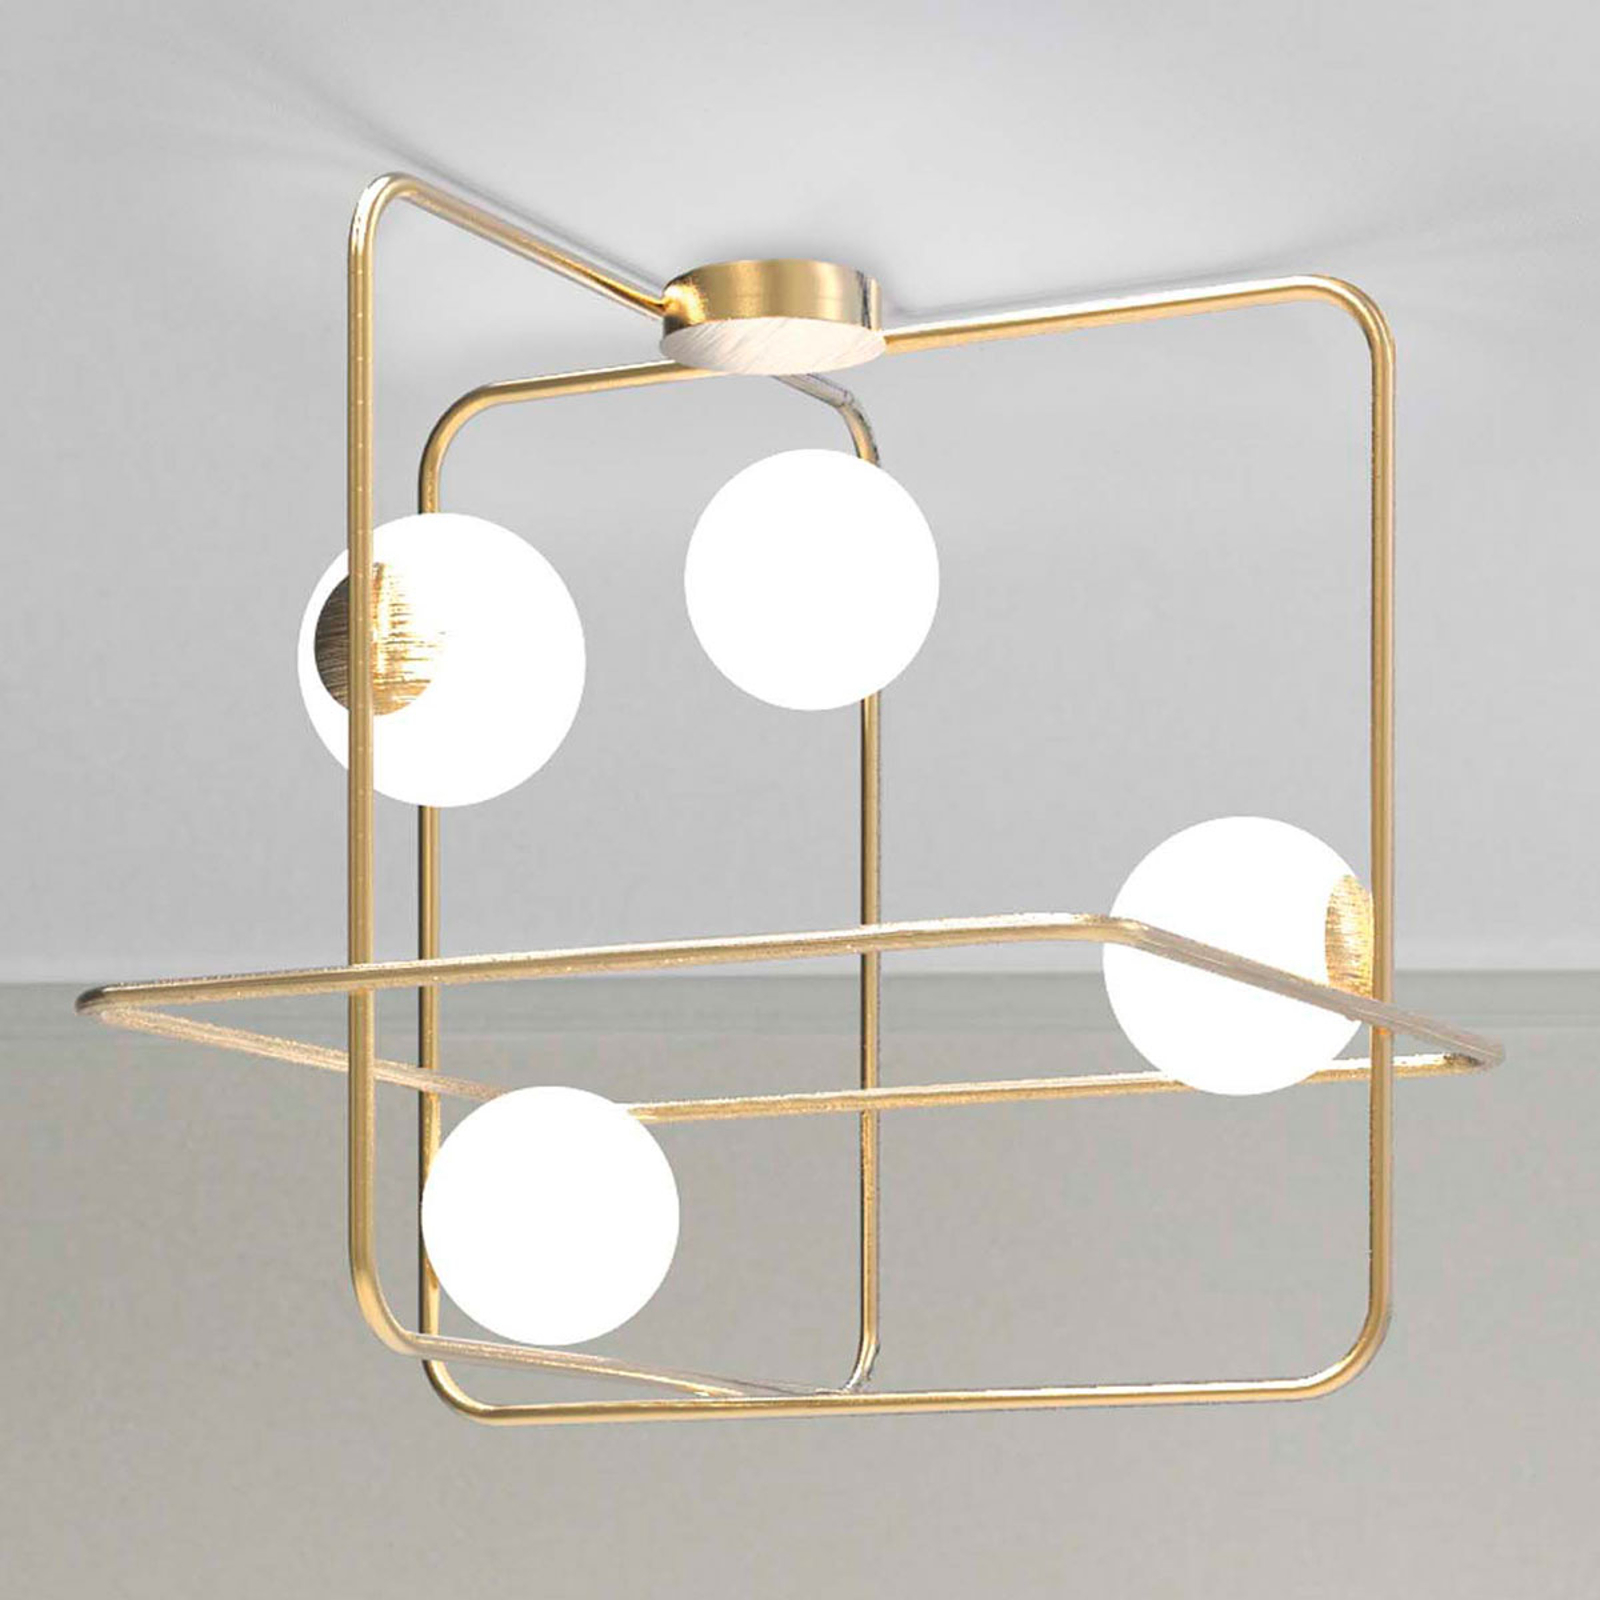 Intrigo loftlampe, kvadrat, satineret gylden